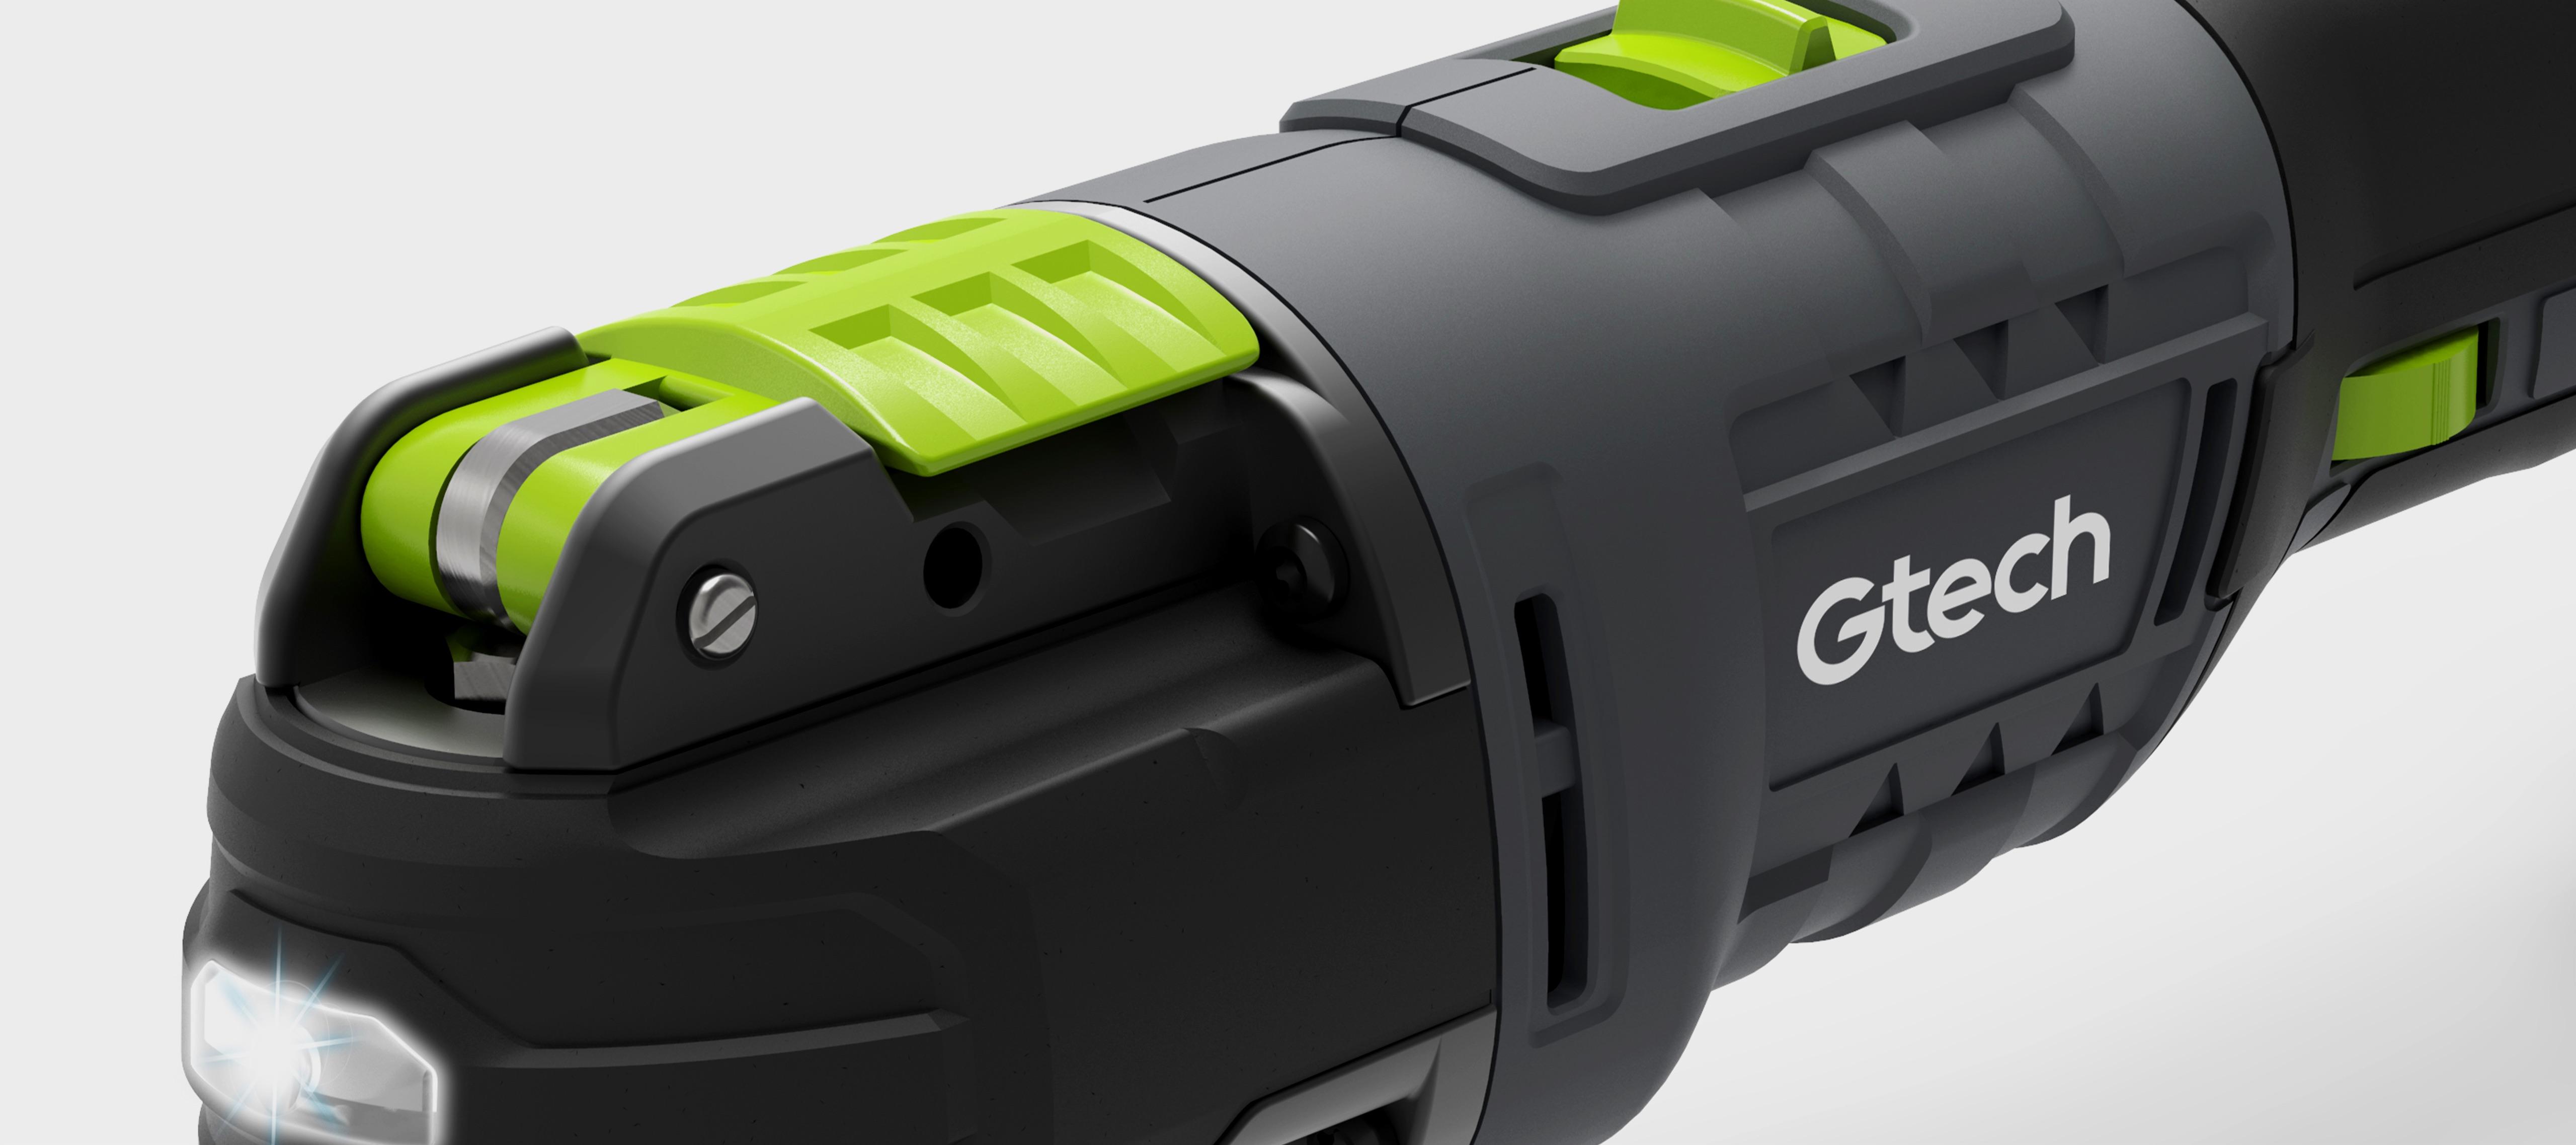 Cordless multi-tool controls